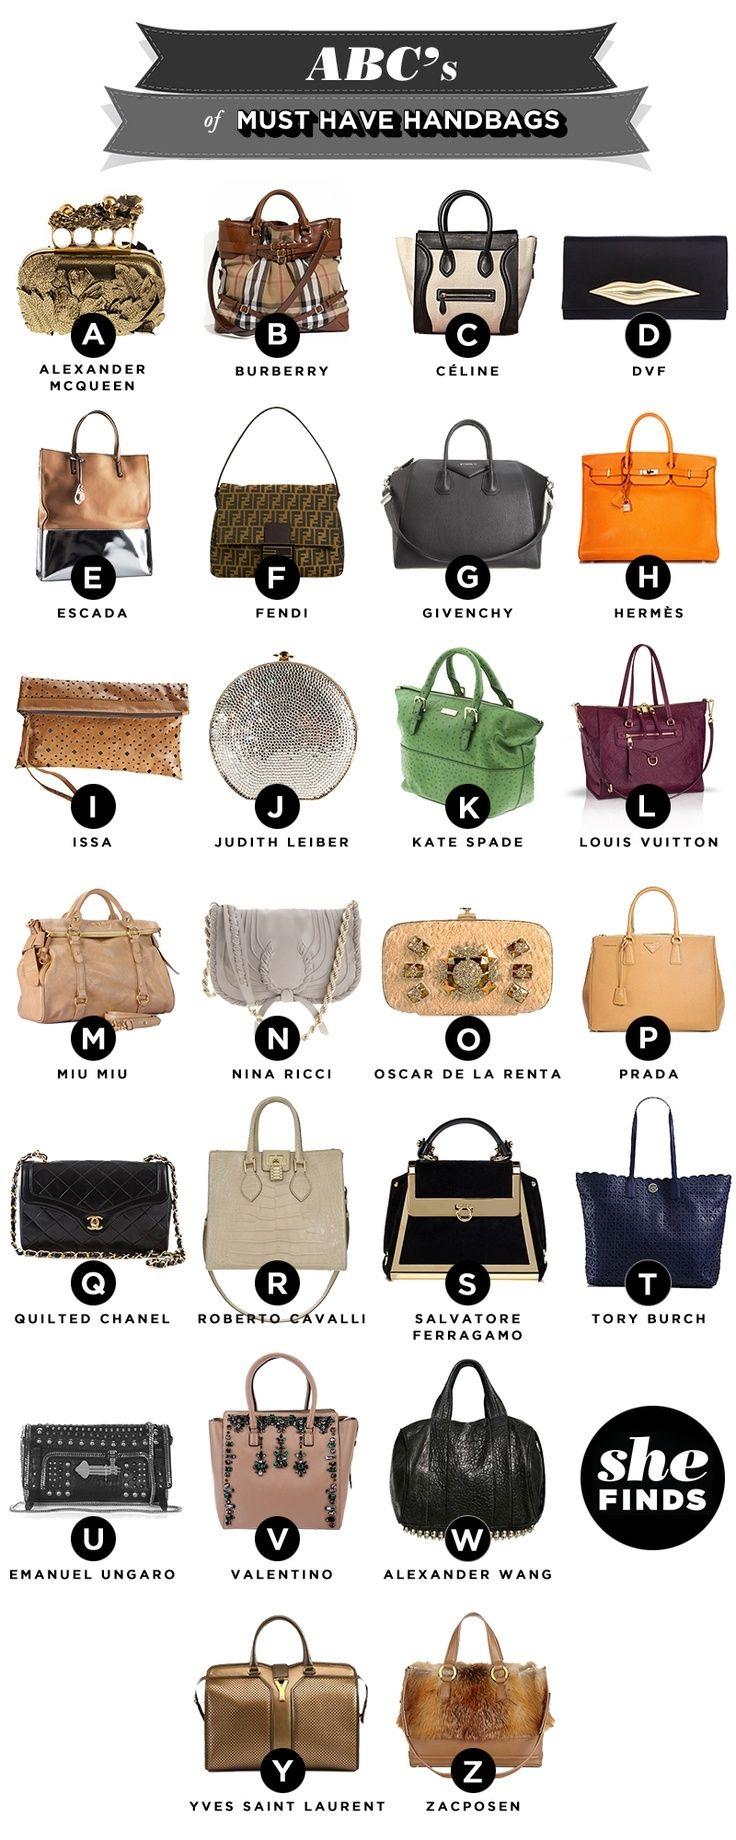 the must have handbags fashion sunglasses chanel designer louis vuitton high fashion gucci purses handbags burberry